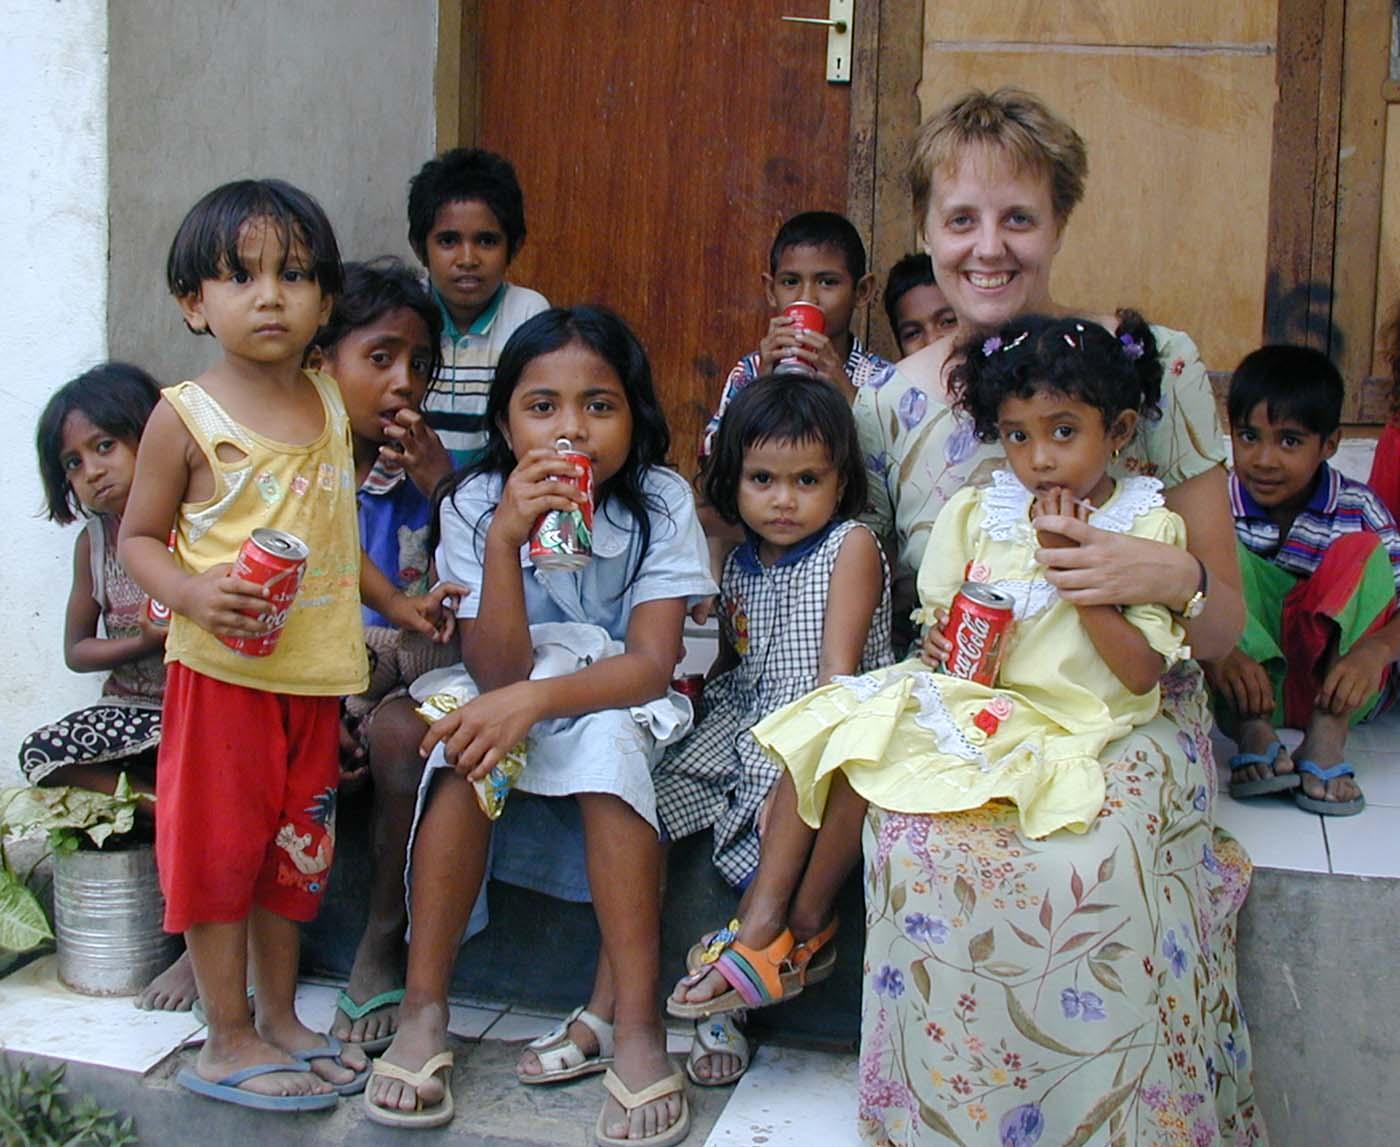 Carmela Baranowska in East Timor, 2000.